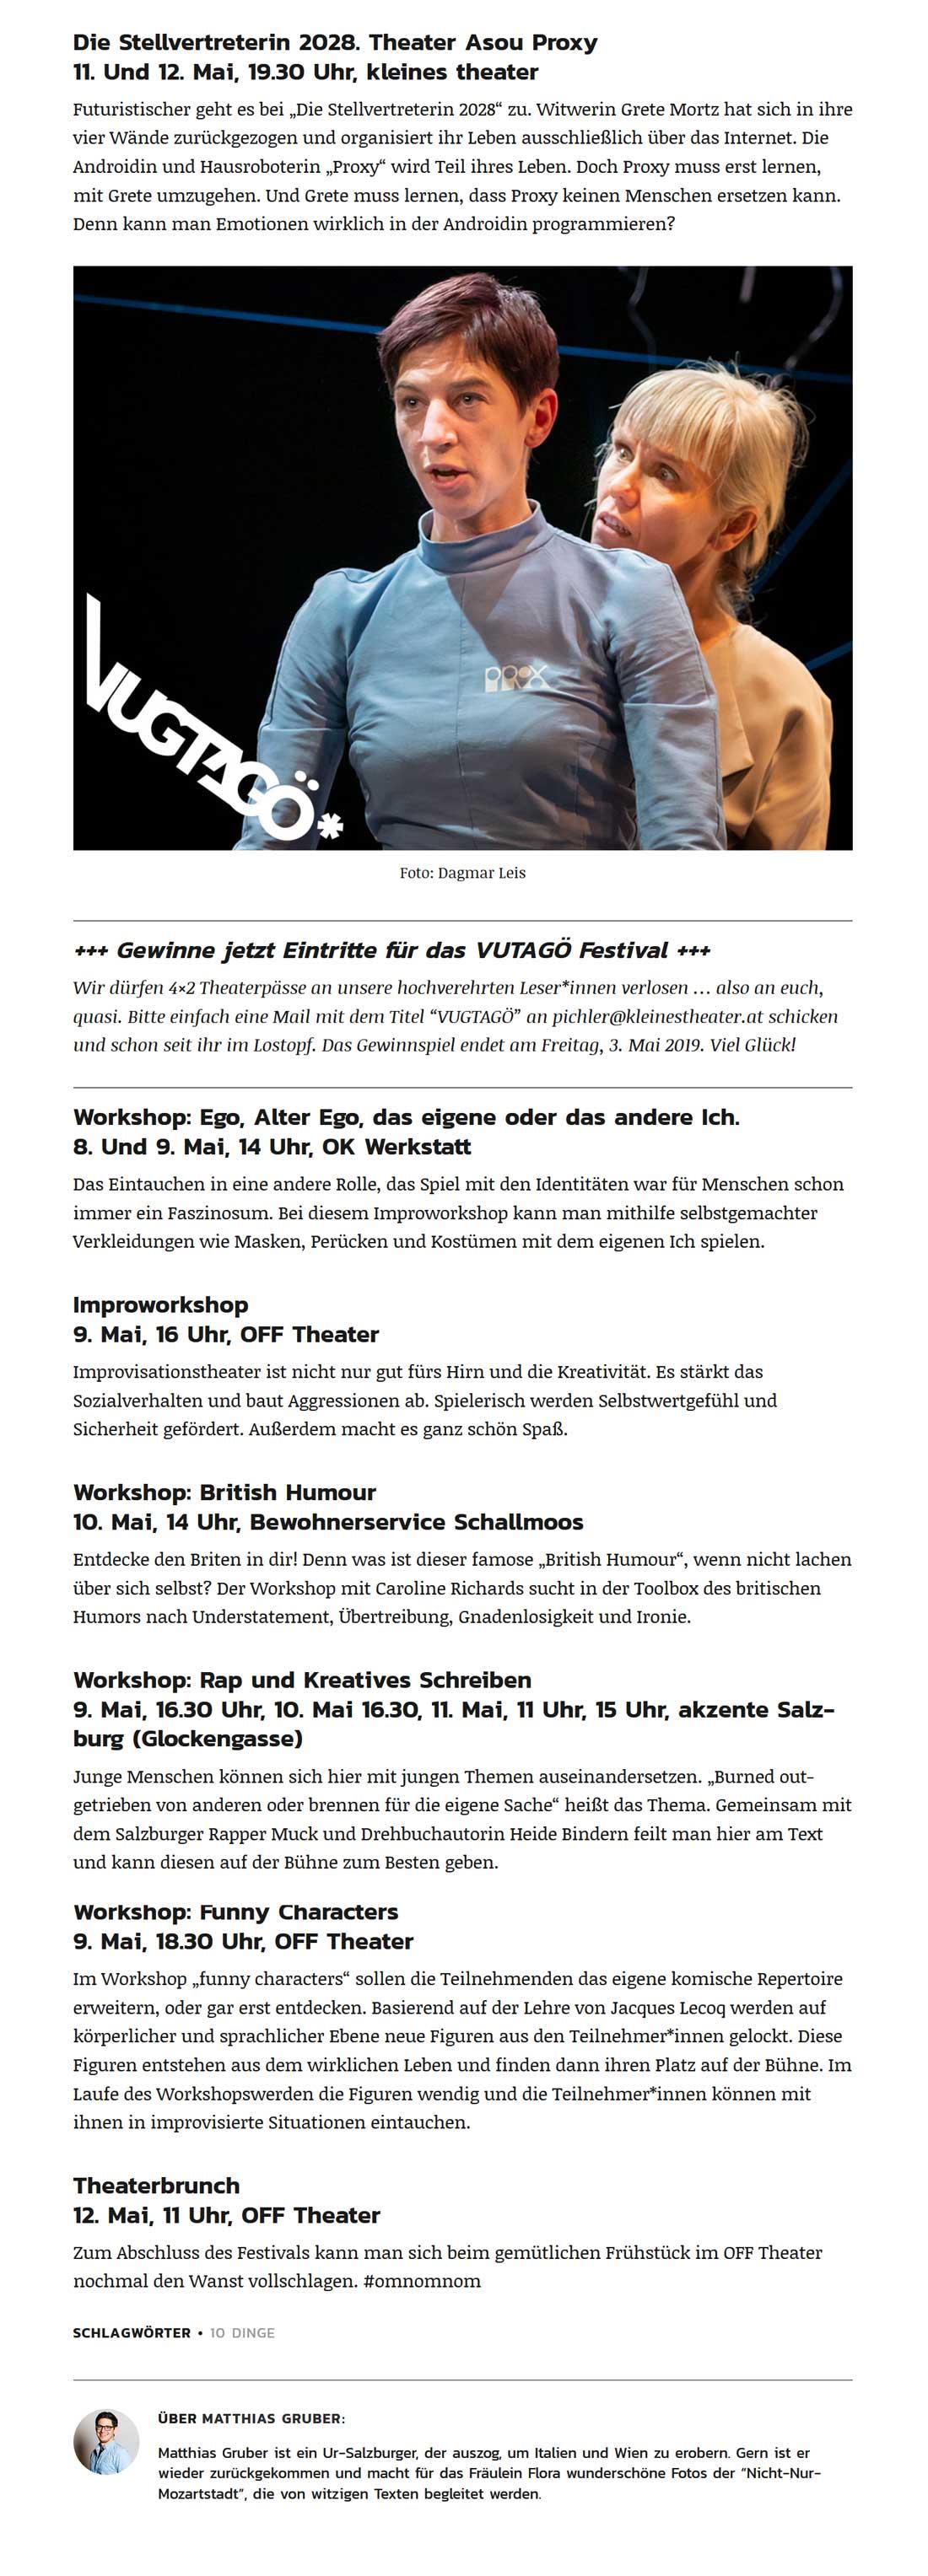 2019 04 24 vugtagoe FF 03 - Unsere 10 Highlights am VUGTAGÖ* Theaterfestival - Fräulein Flora vom 24.04.2019